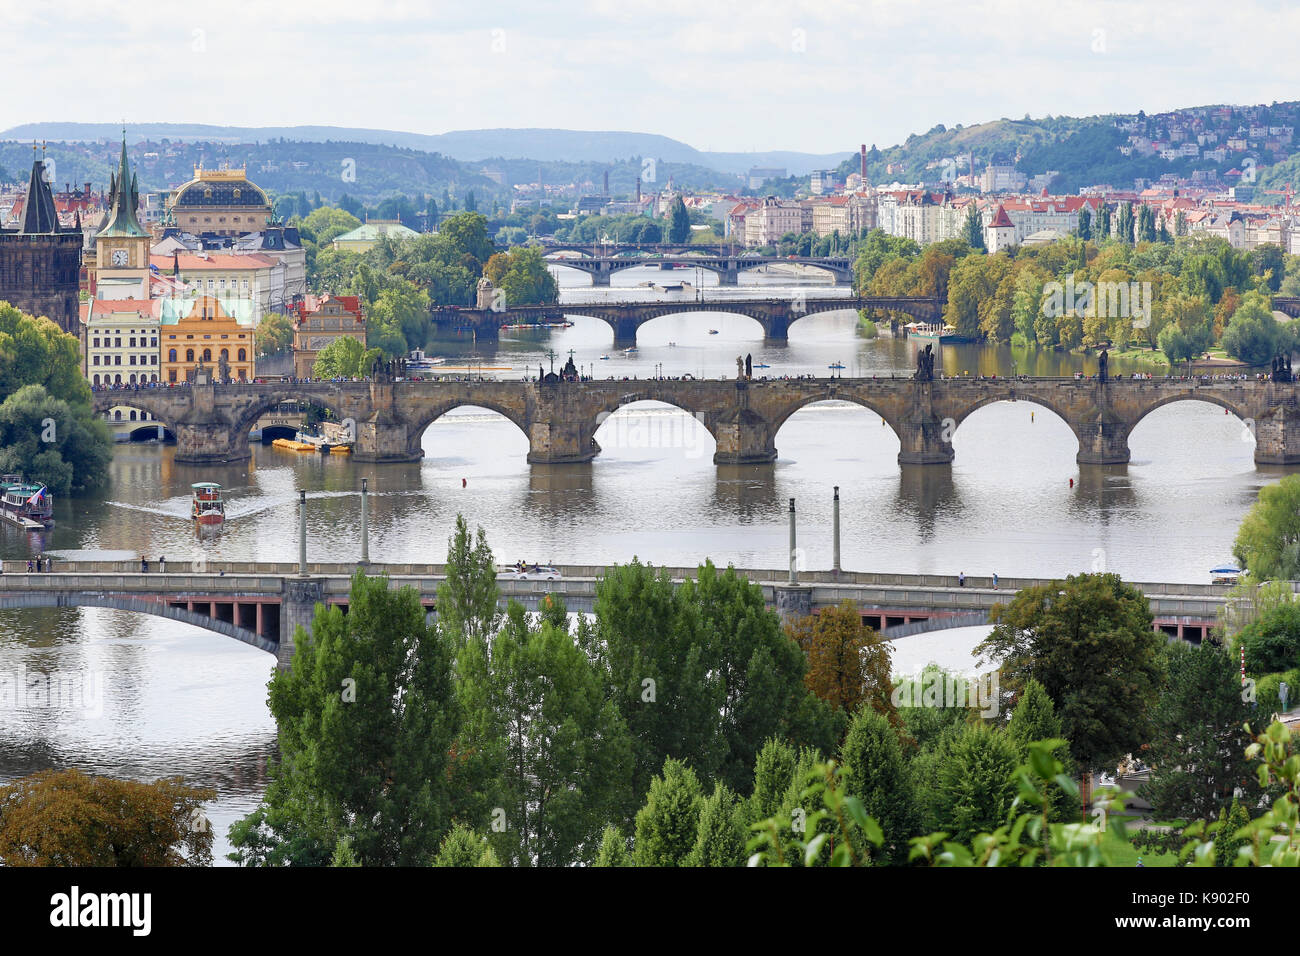 Prague, Czech Republic - August 21, 2017: View of the city's bridges from the top of Letna park Stock Photo